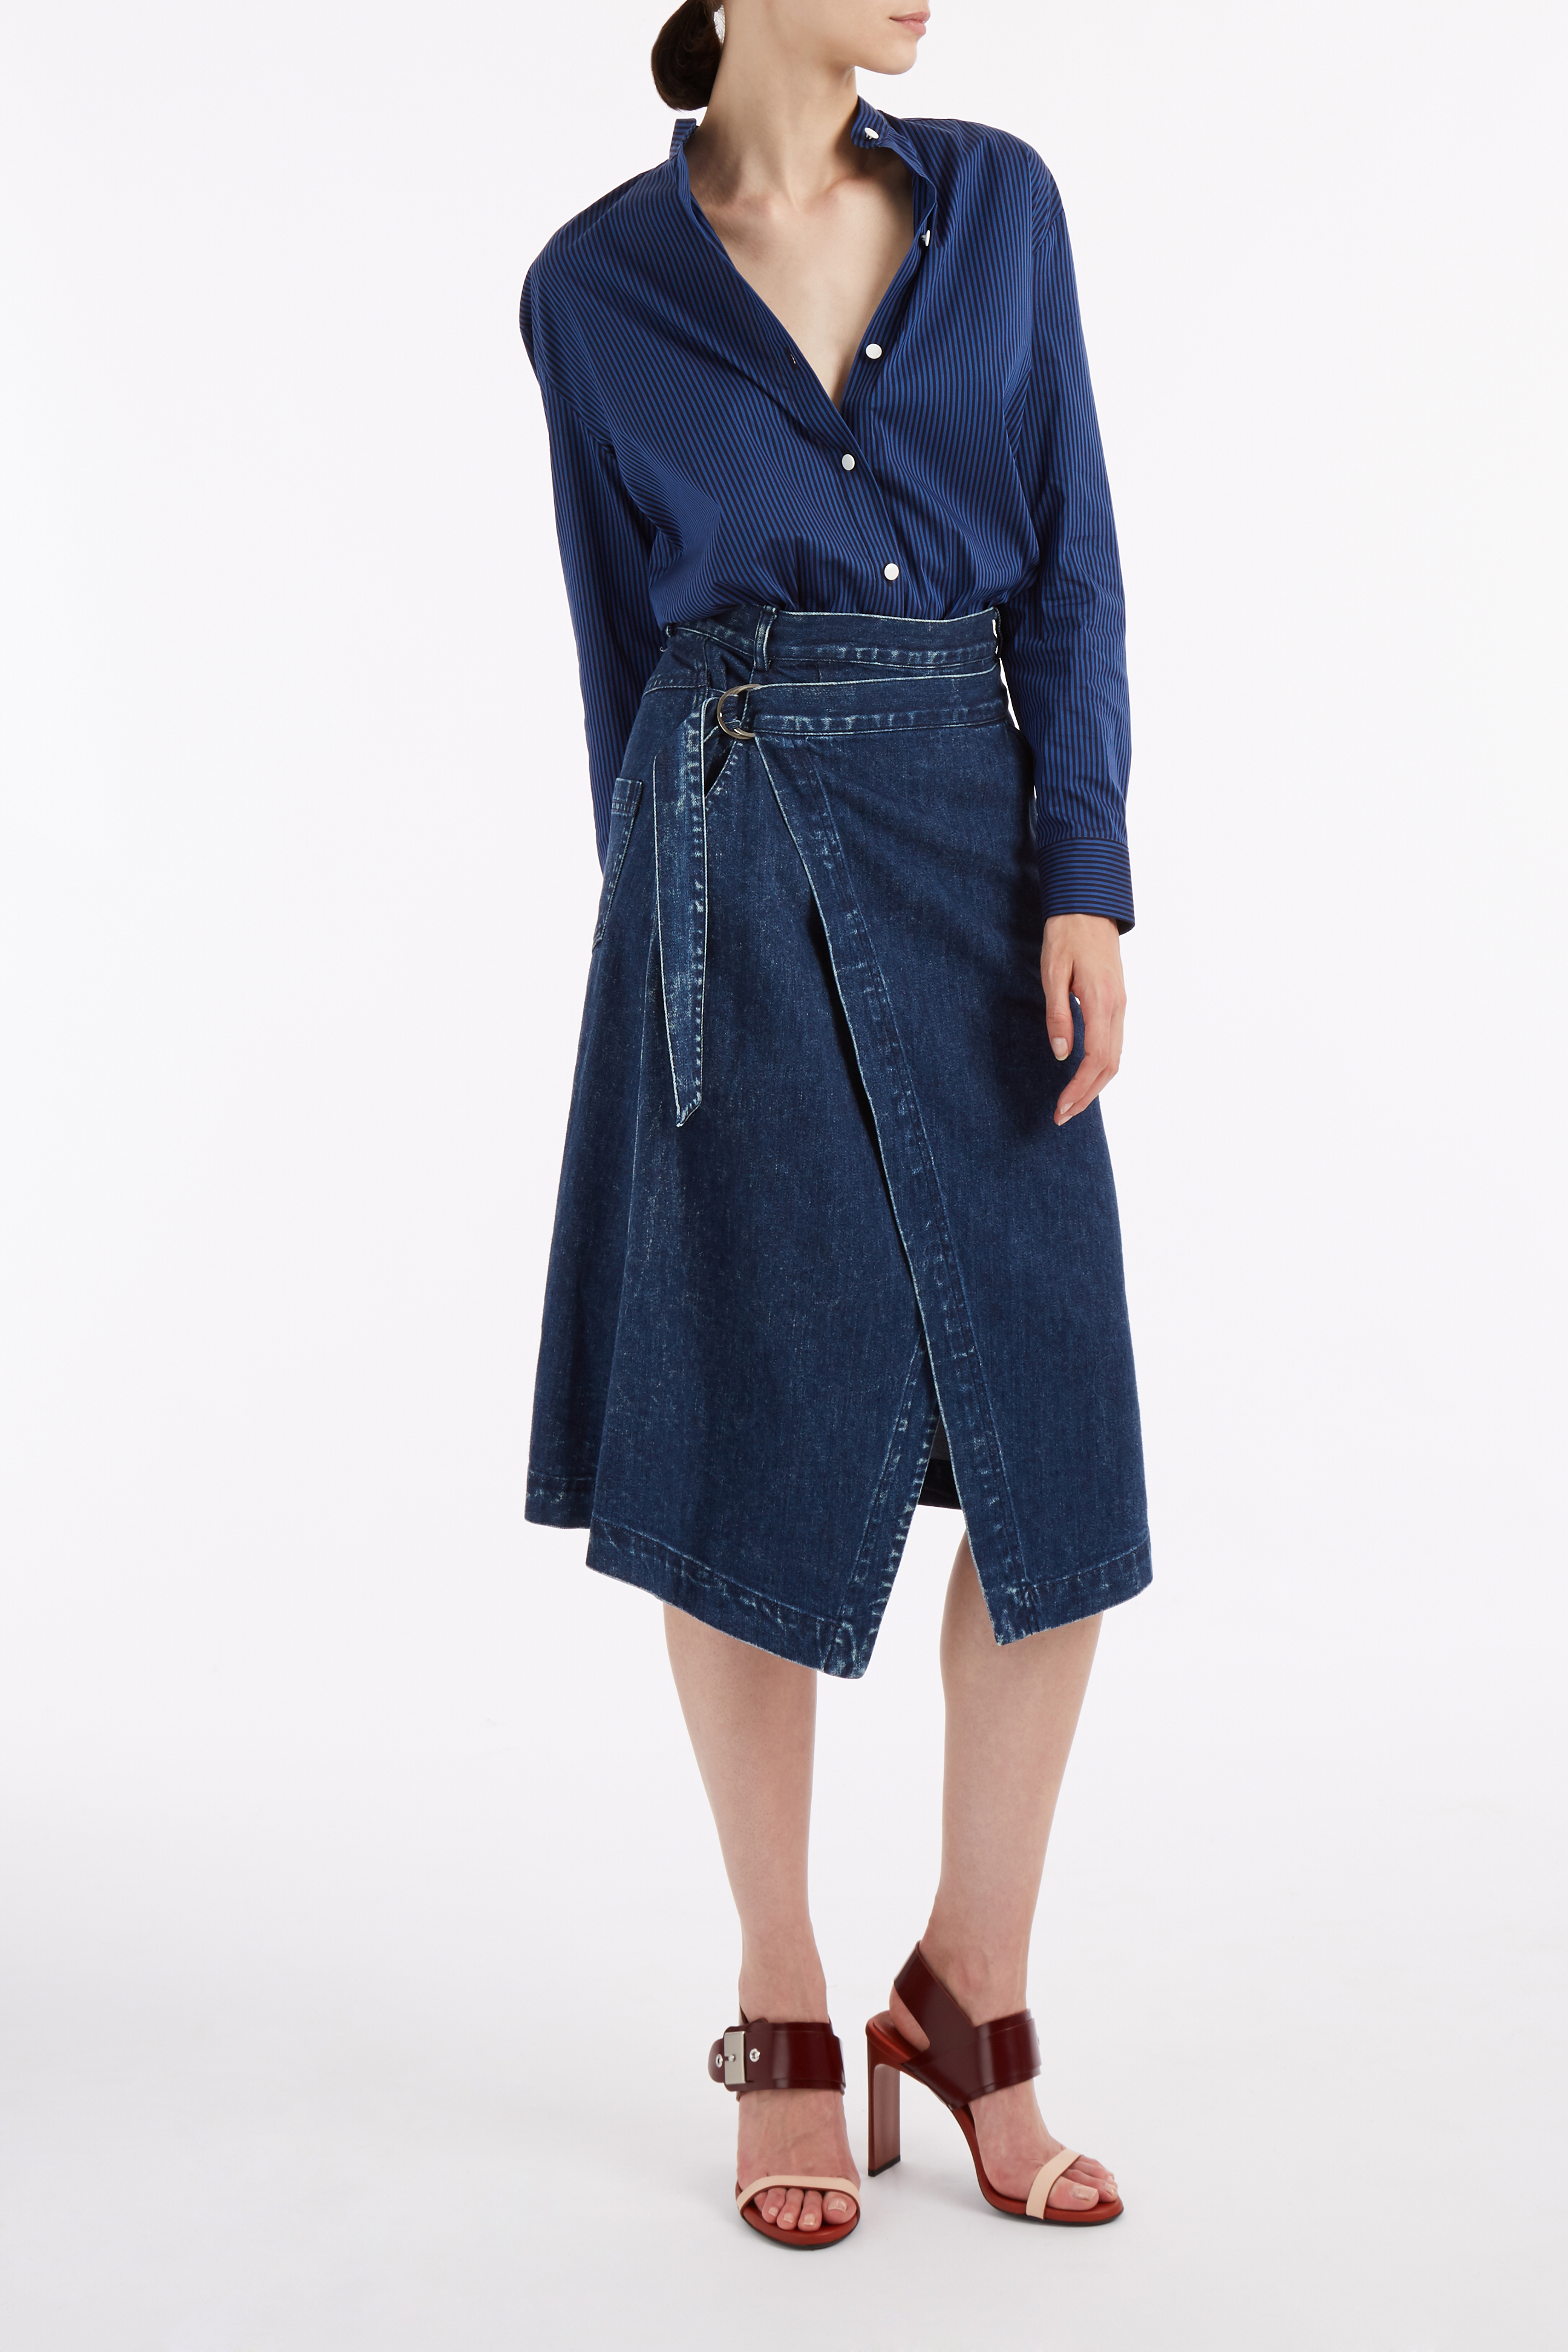 sea denim wrap skirt in blue lyst